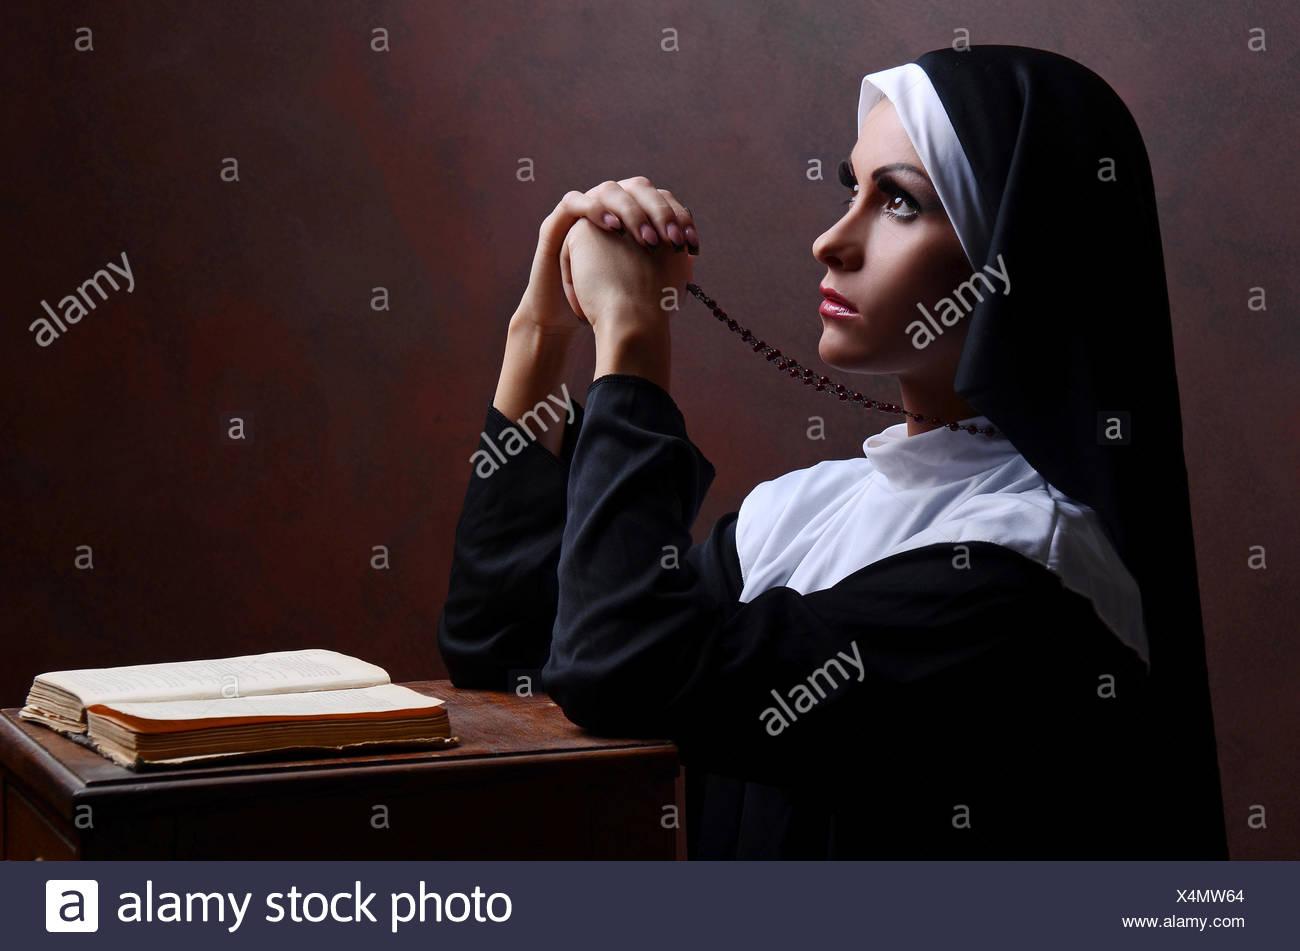 Young attractive nun praying - Stock Image